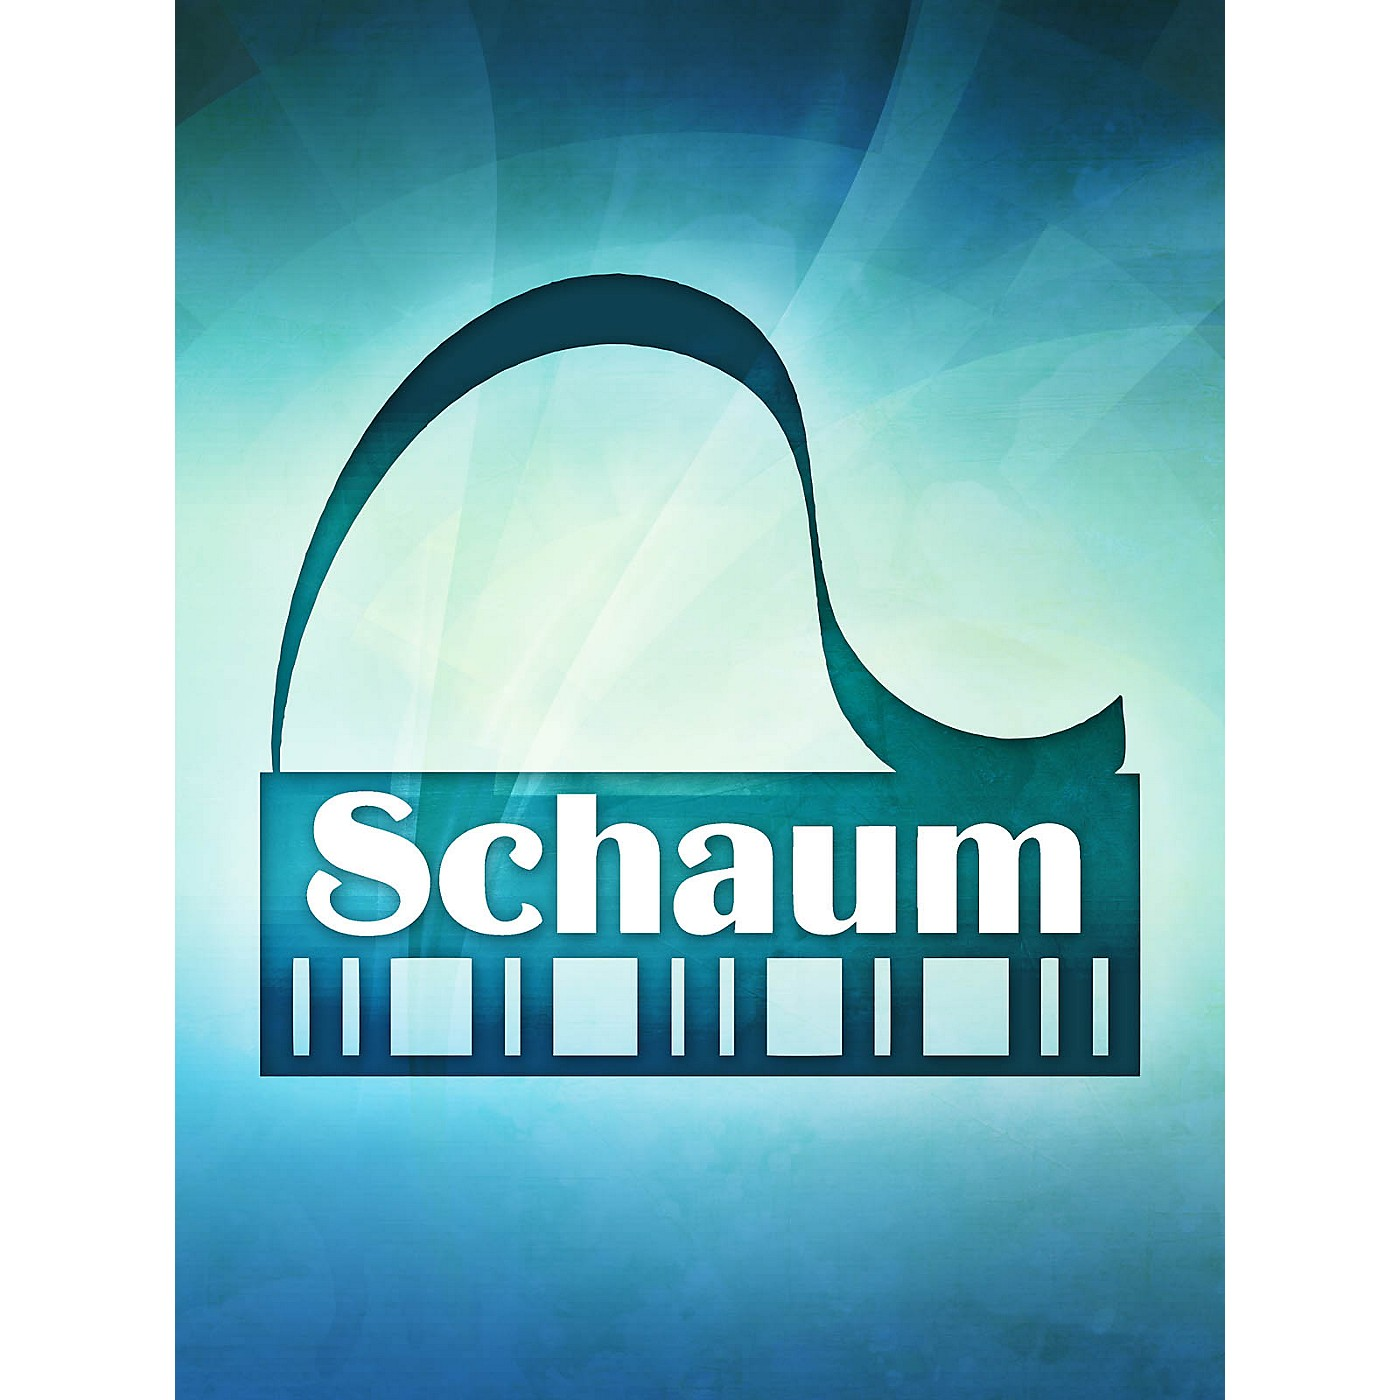 SCHAUM Fingerpower® (Level 4 GM Disk Only) Educational Piano Series Softcover Written by John W. Schaum thumbnail